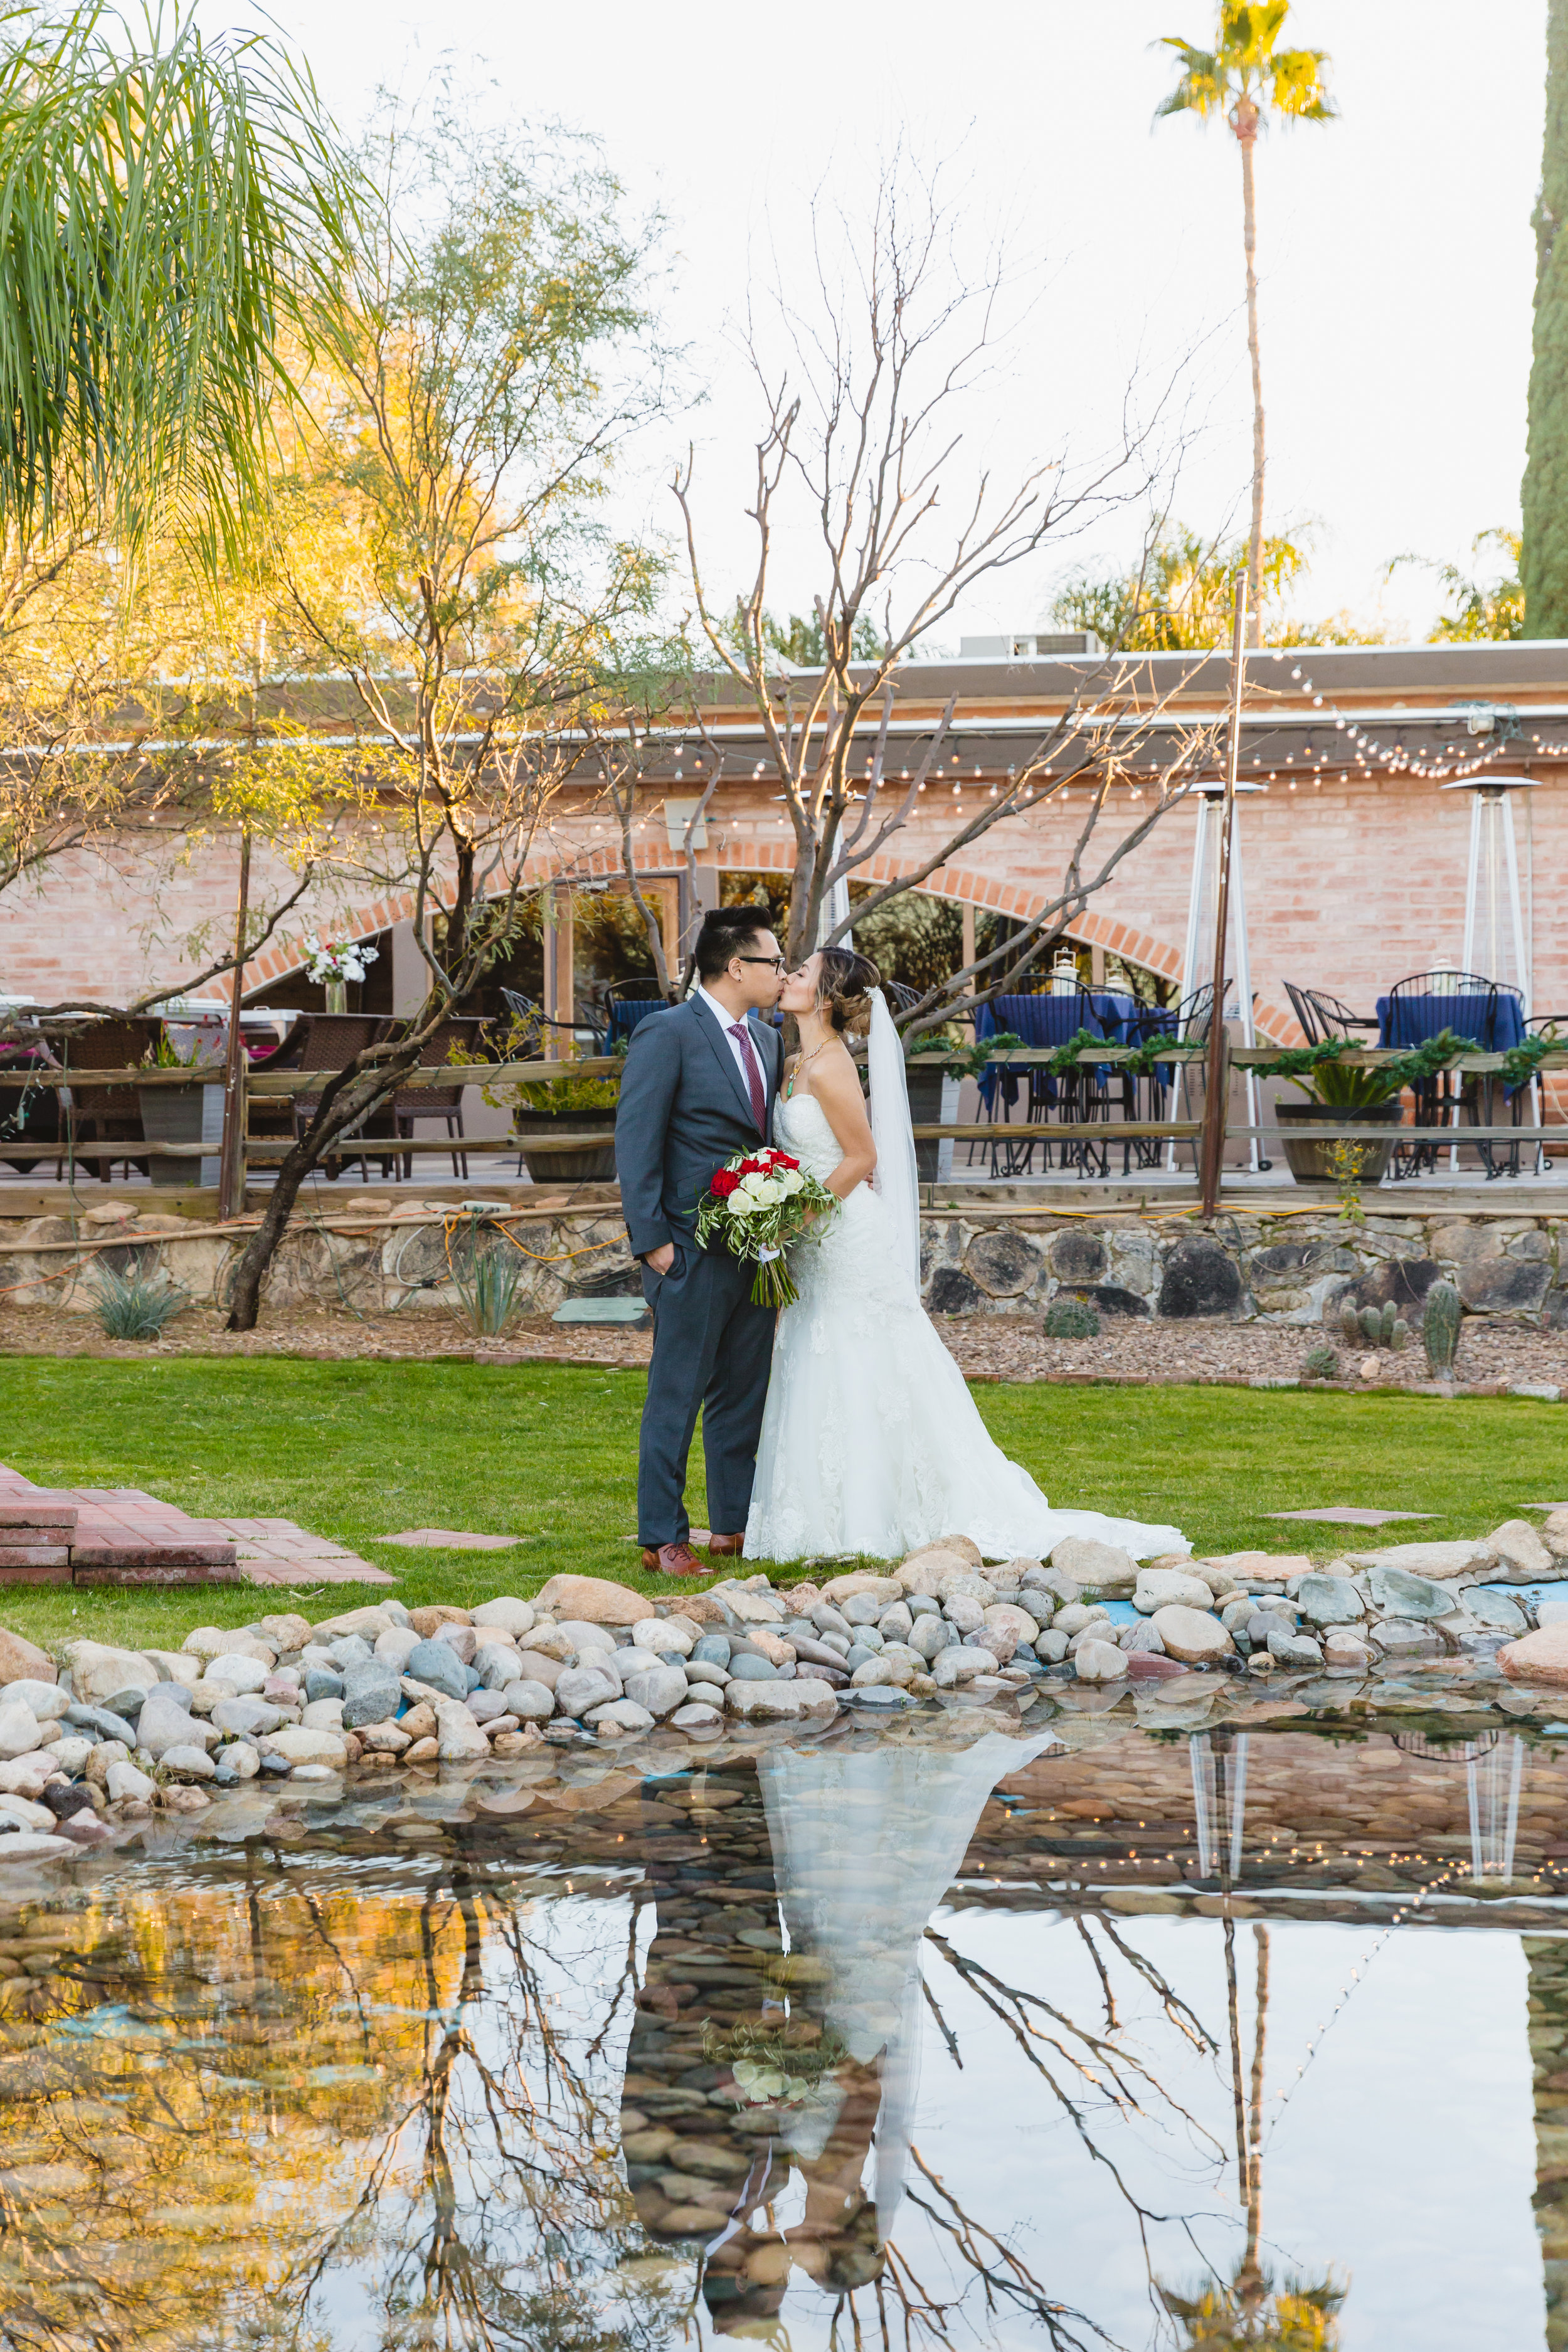 Jason Snorlax Photography (Pratarn & Teresa Wedding)-544.jpg